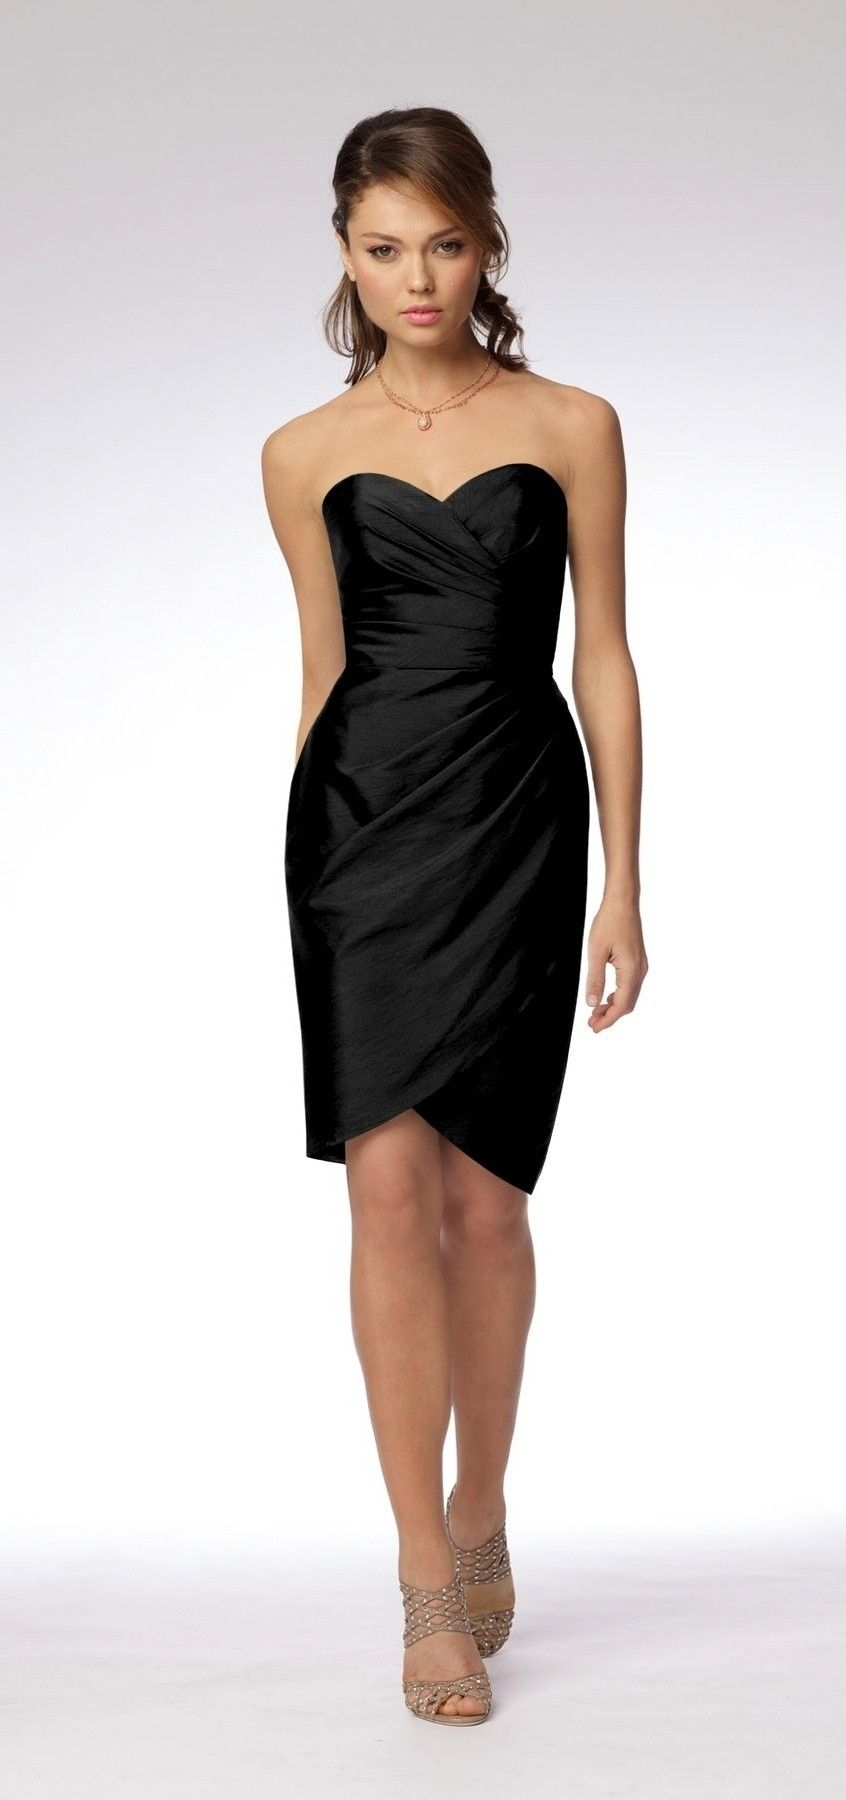 Black sweetheart strapless short graduation dress my style